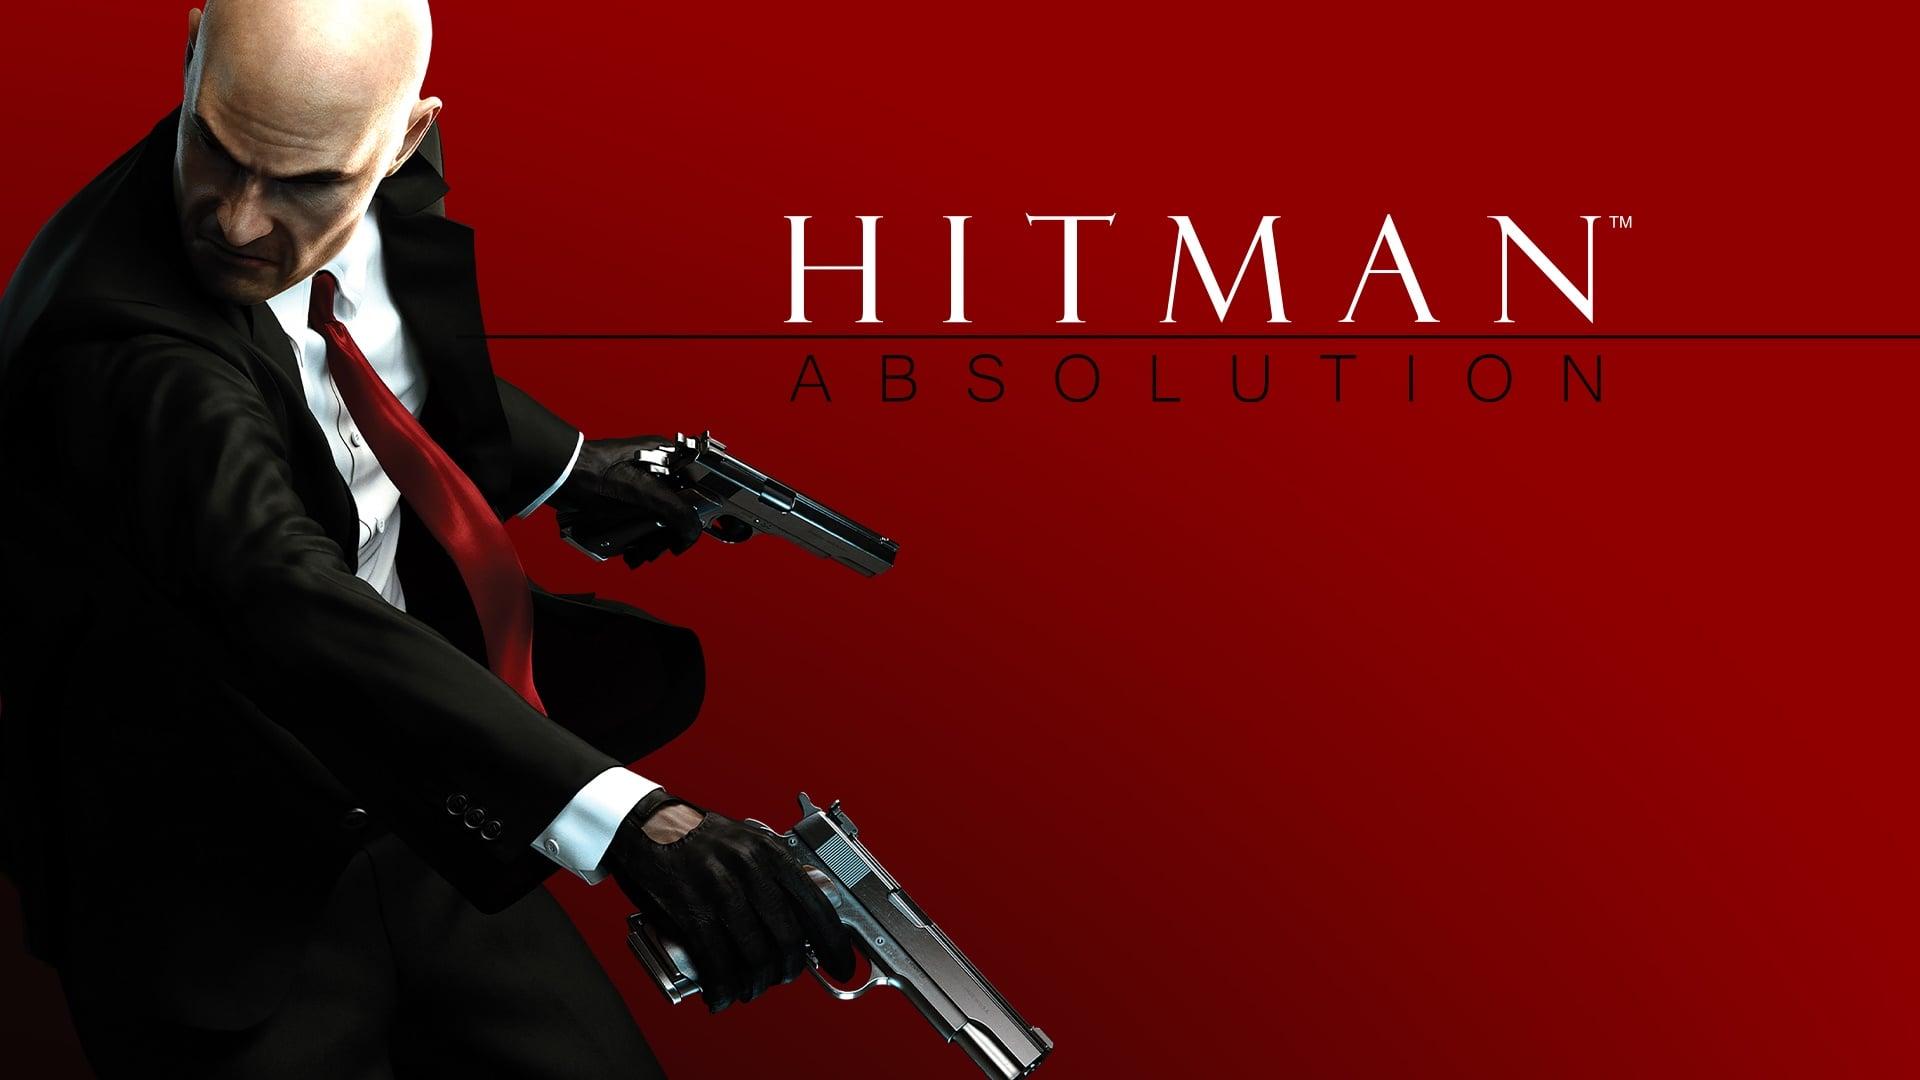 Hitman Absolution Hd Achievement List Revealed